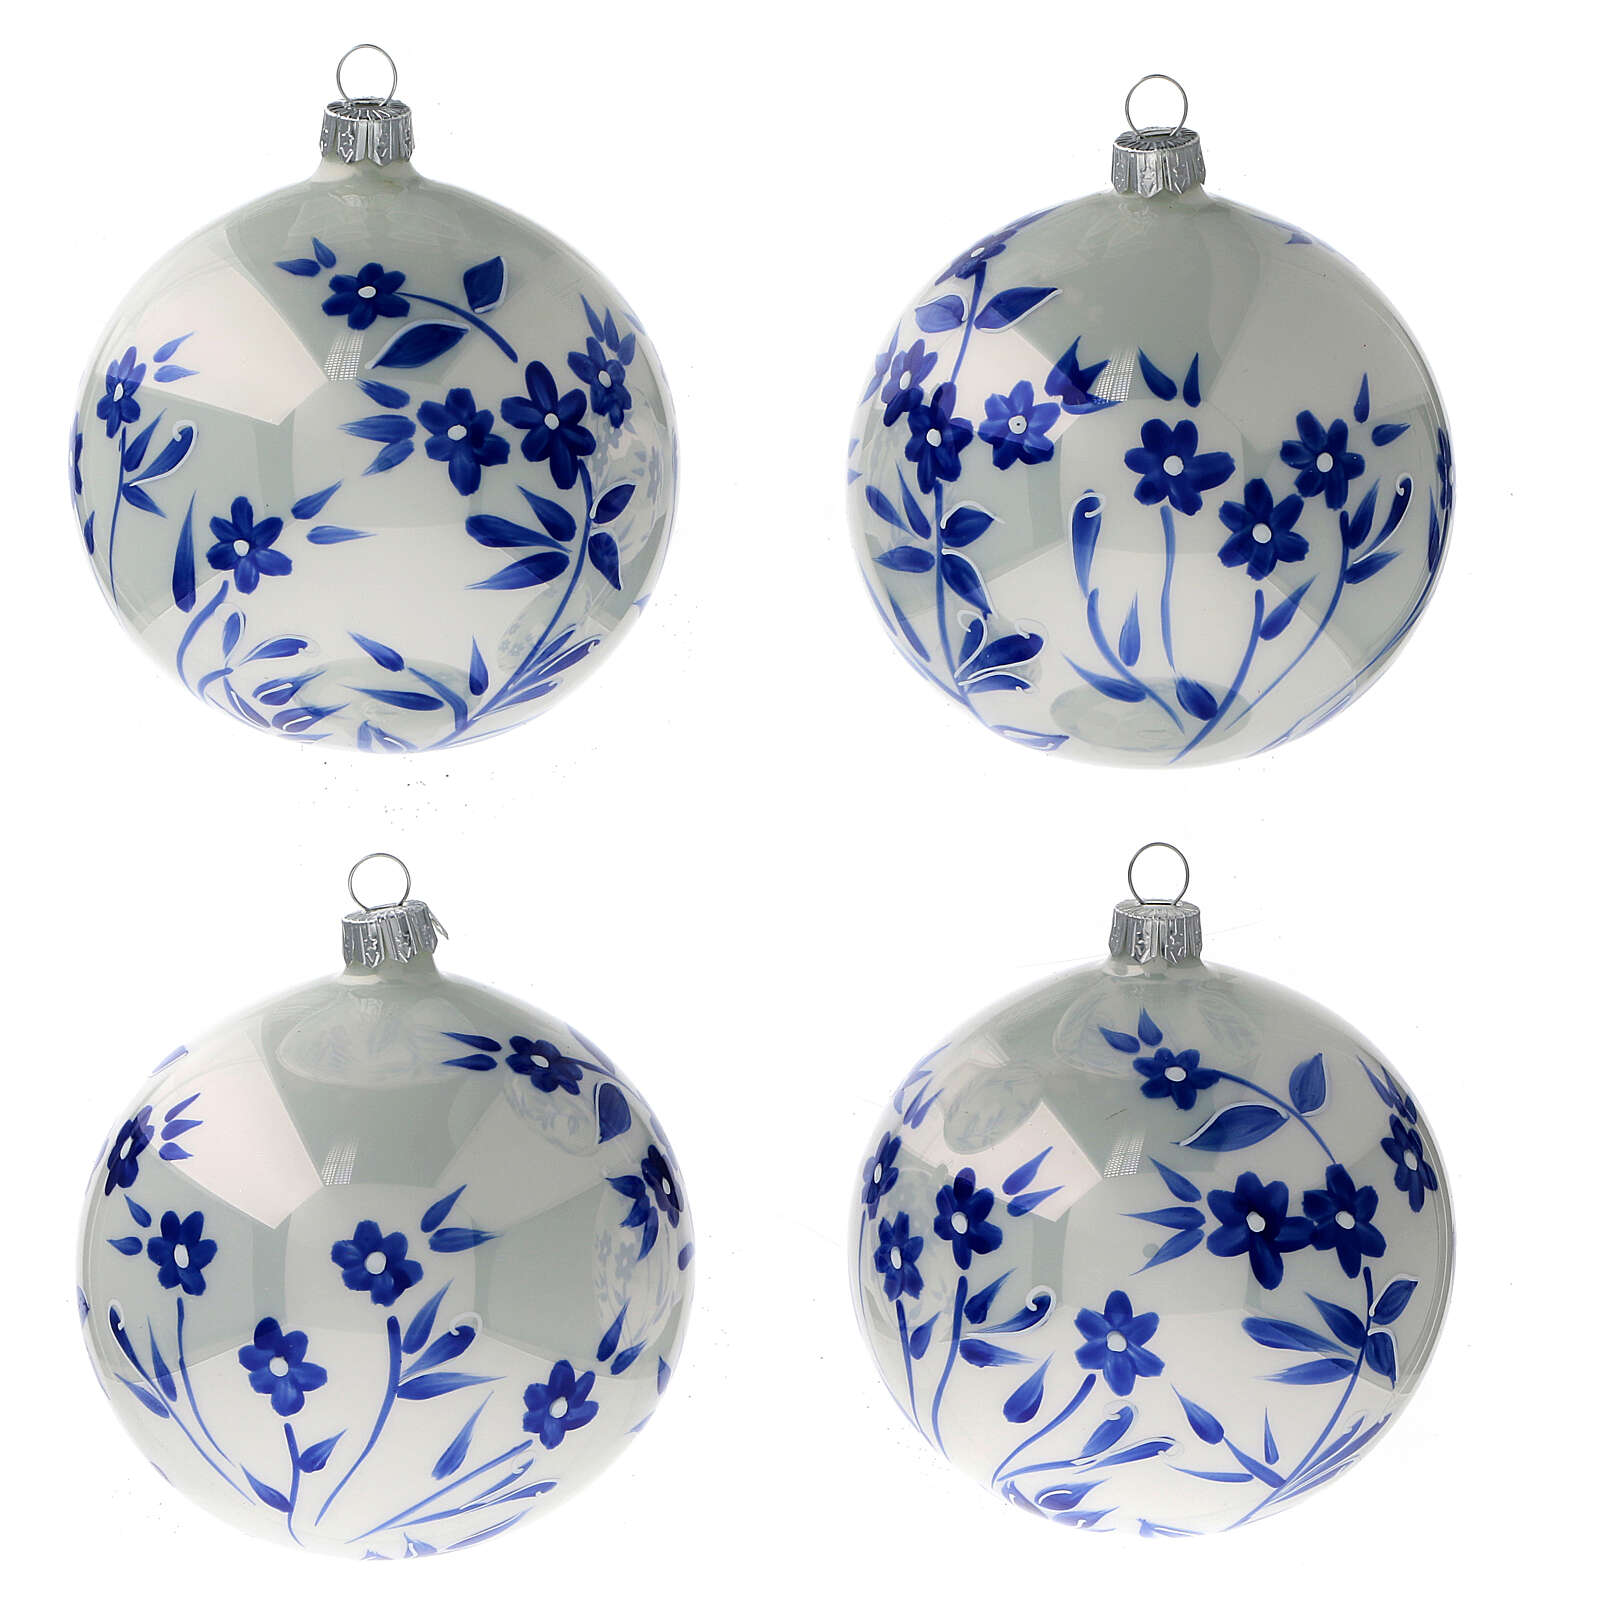 Christmas ball white flowers blue stylised blown glass 100 mm 4 pcs 4